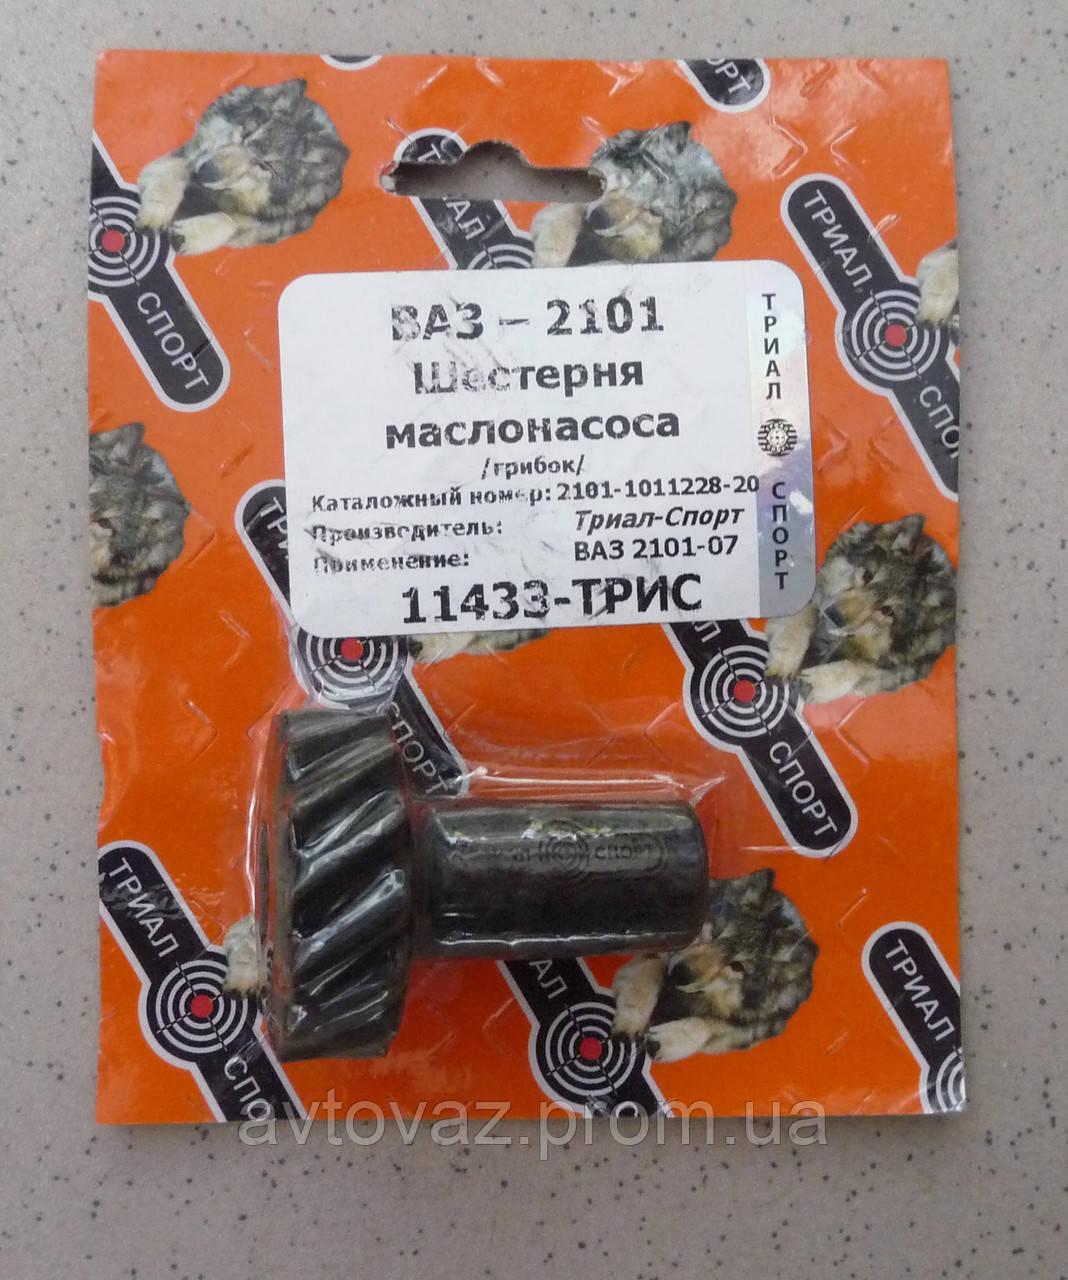 Шестерня привода маслонасоса, грибок ВАЗ 2101, ВАЗ 2102, ВАЗ 2105, ВАЗ 2106, ВАЗ 2107 (Триал-Спорт)